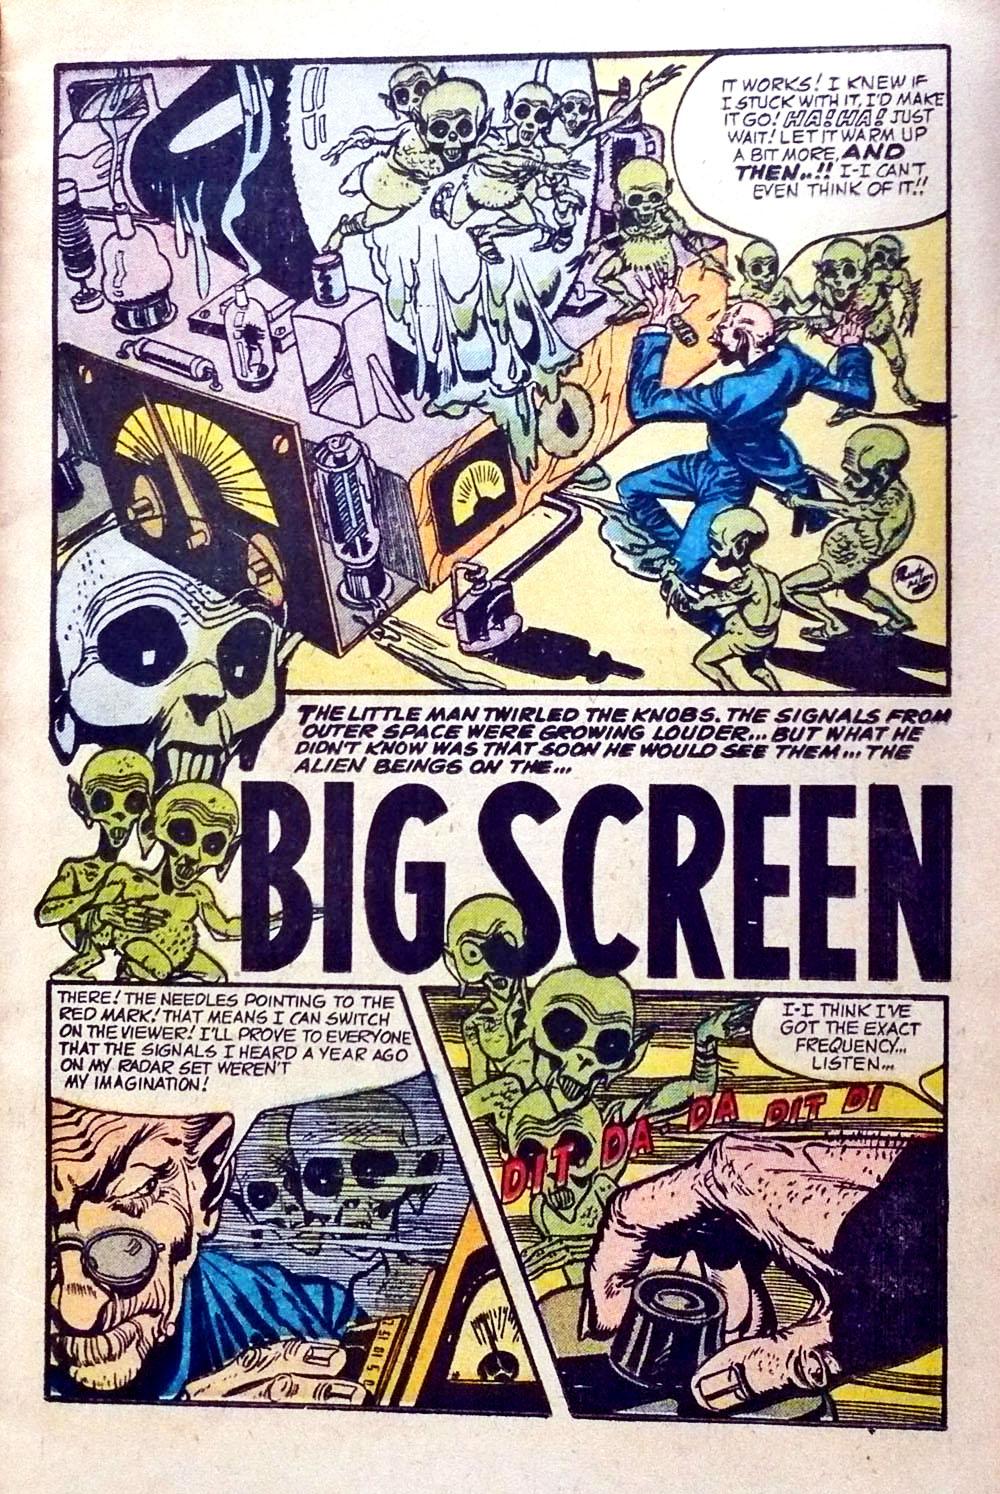 BigScreen0